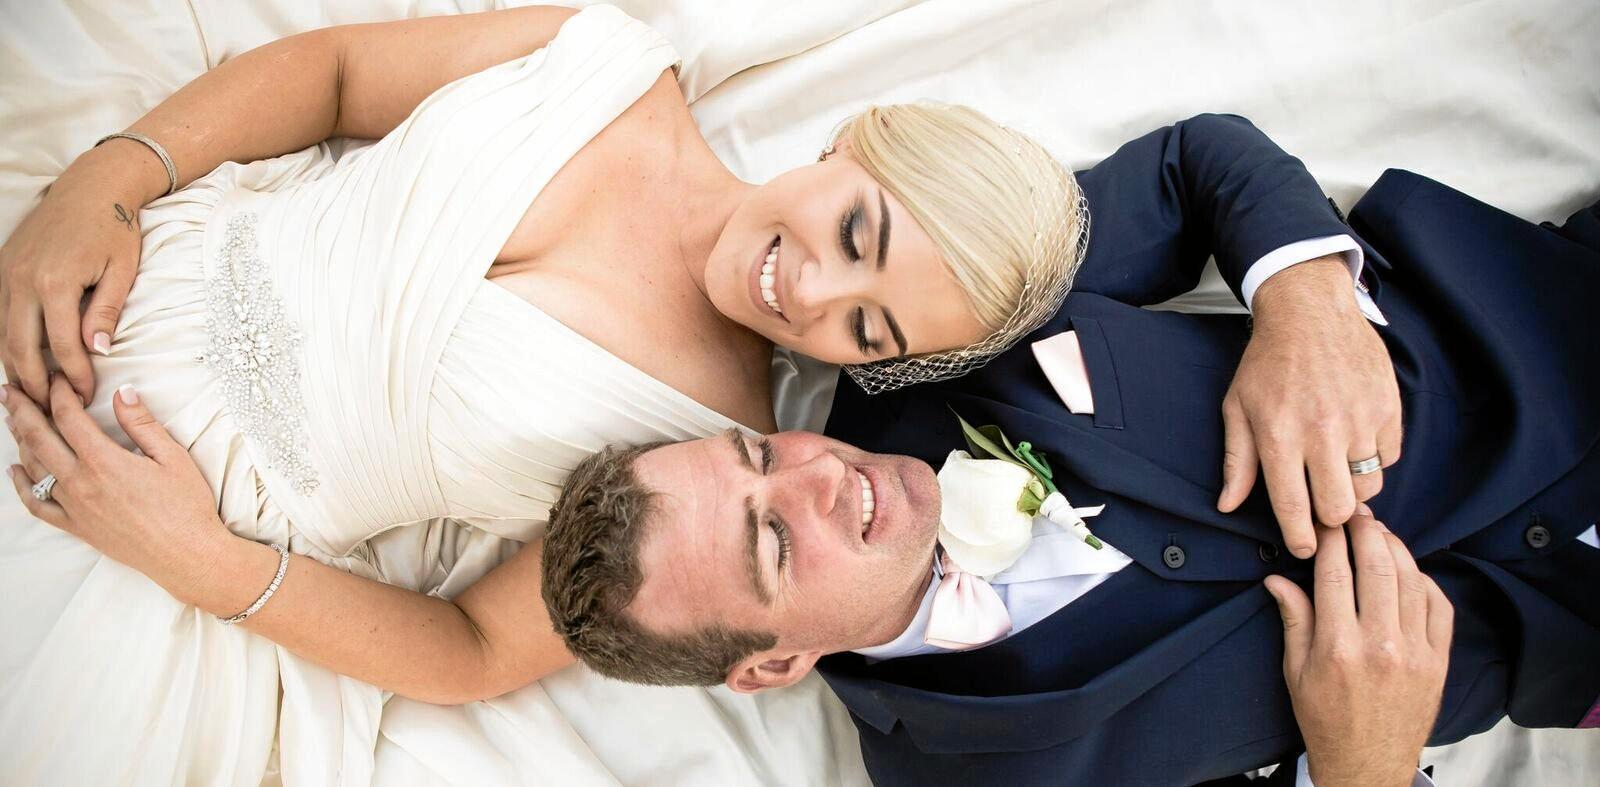 Stephanie and Luke Richardson on their wedding day in September 2017.